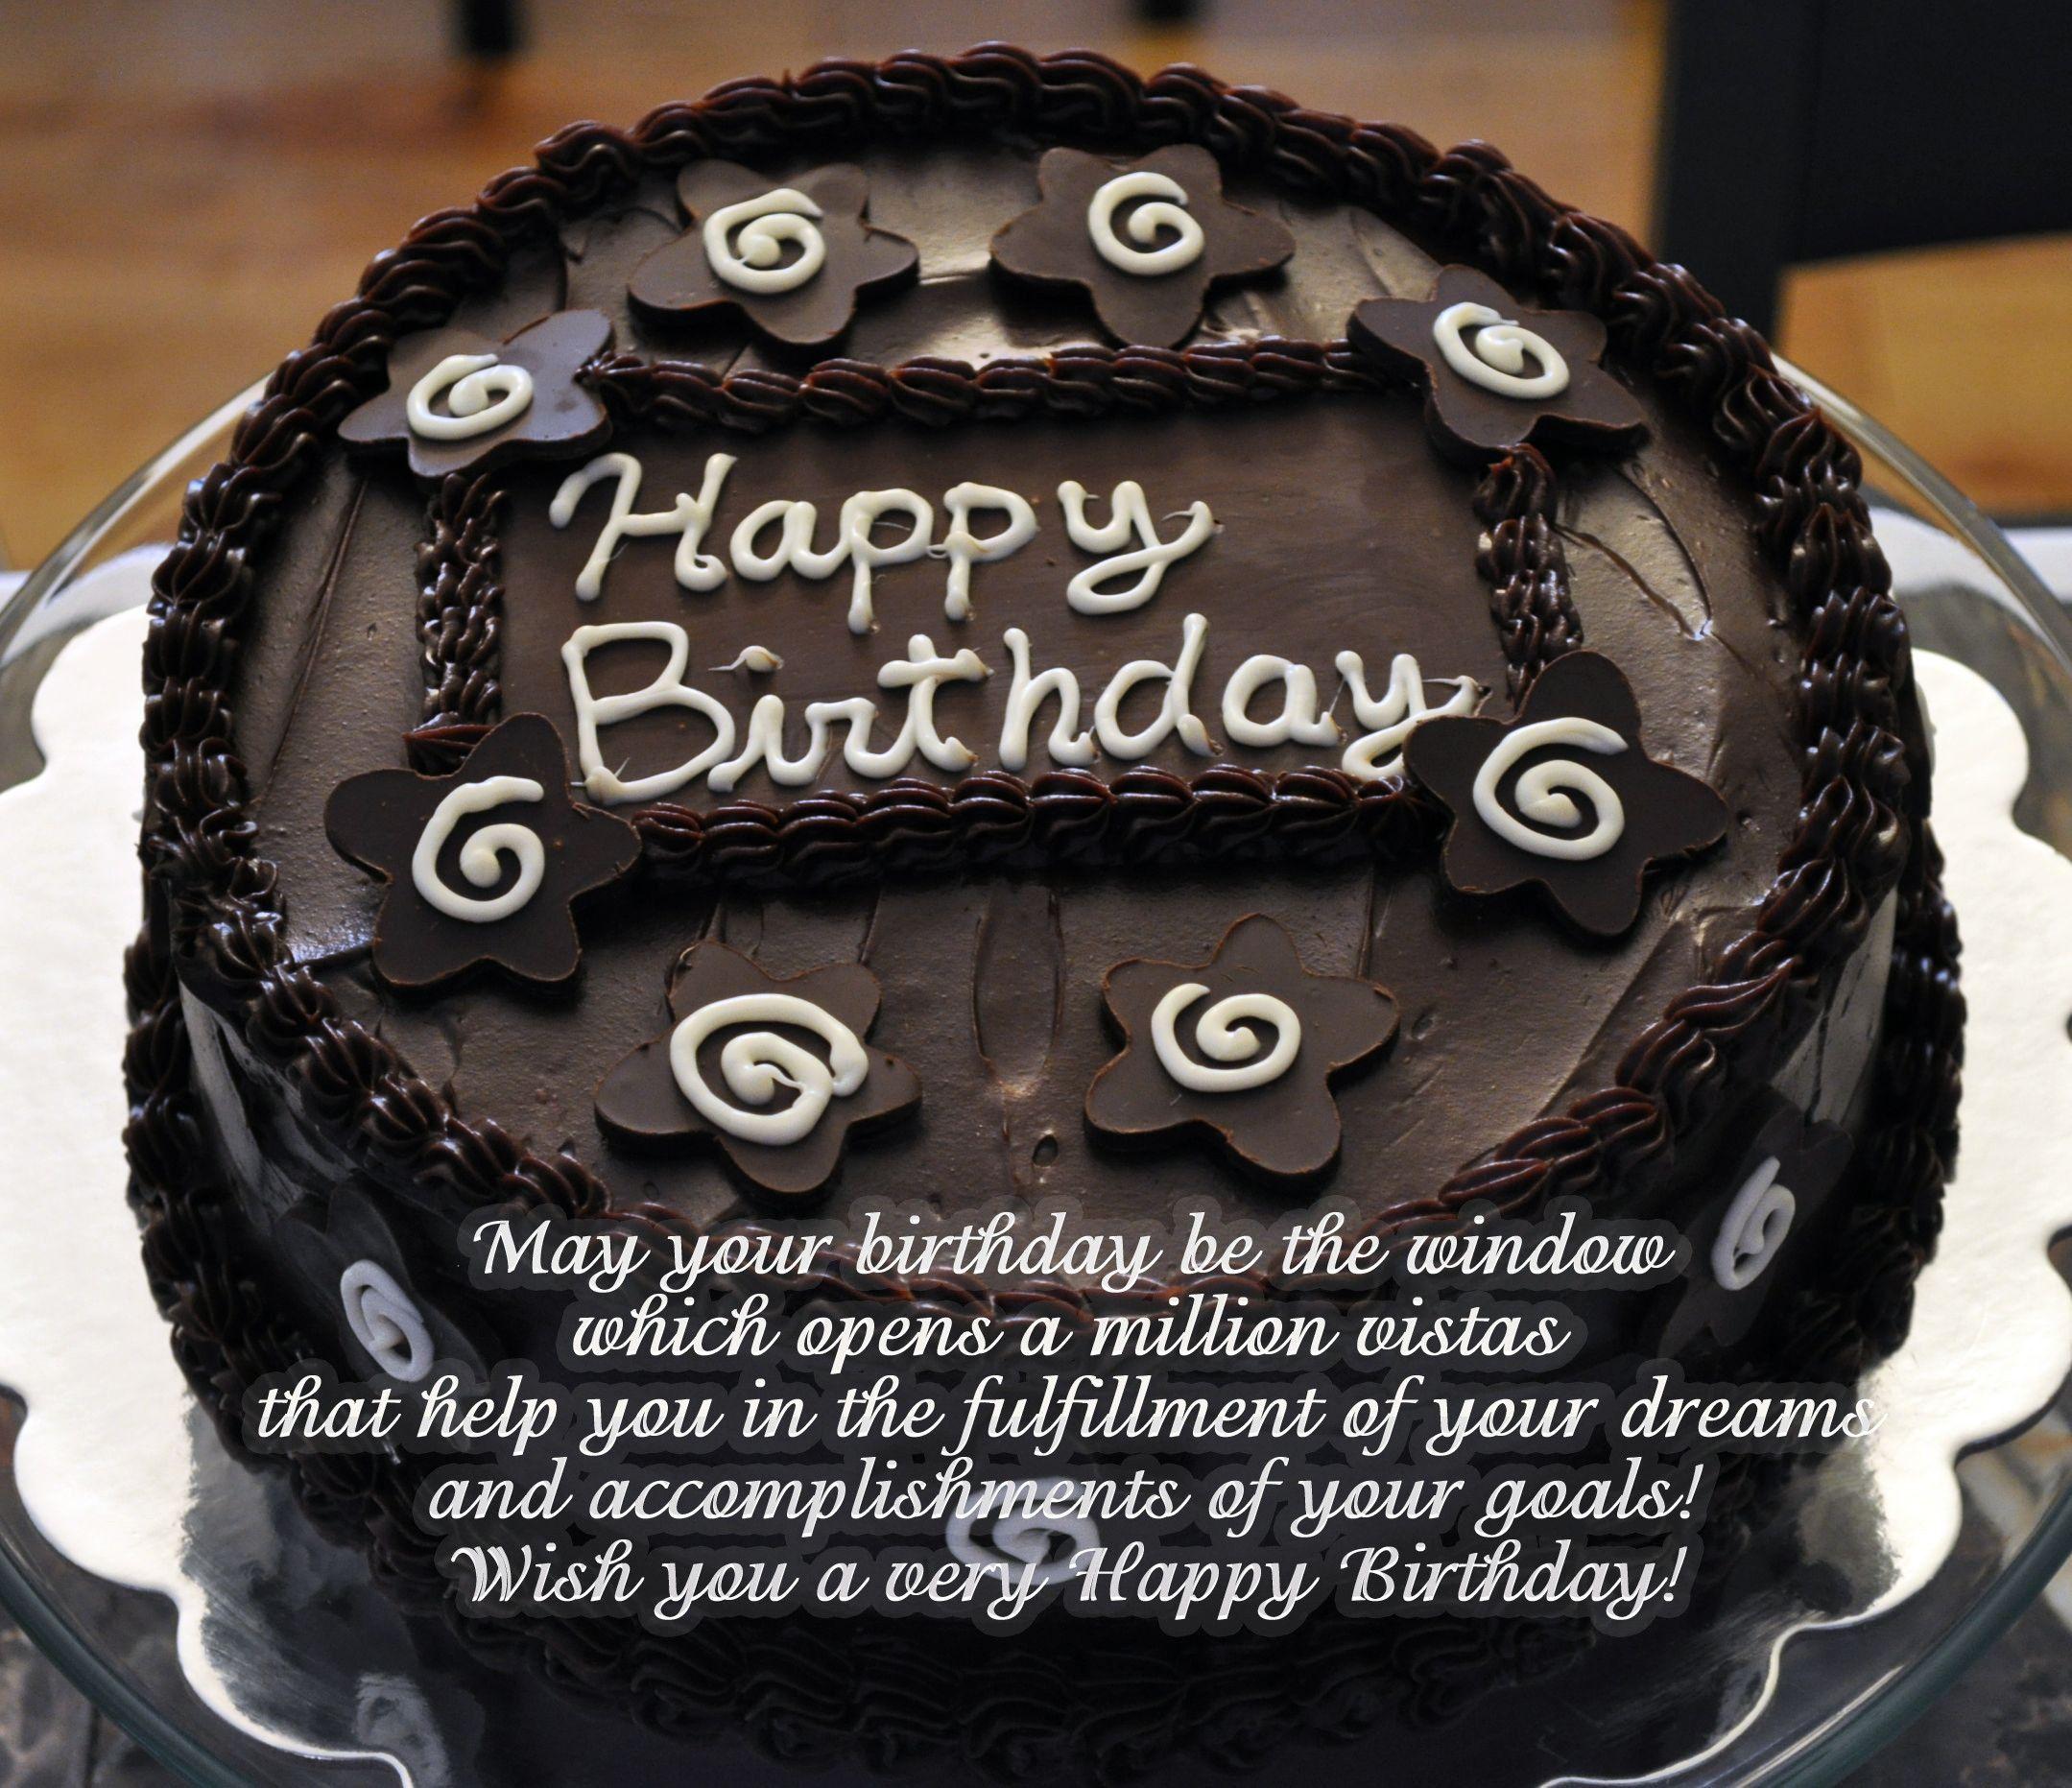 Birthday words in cake